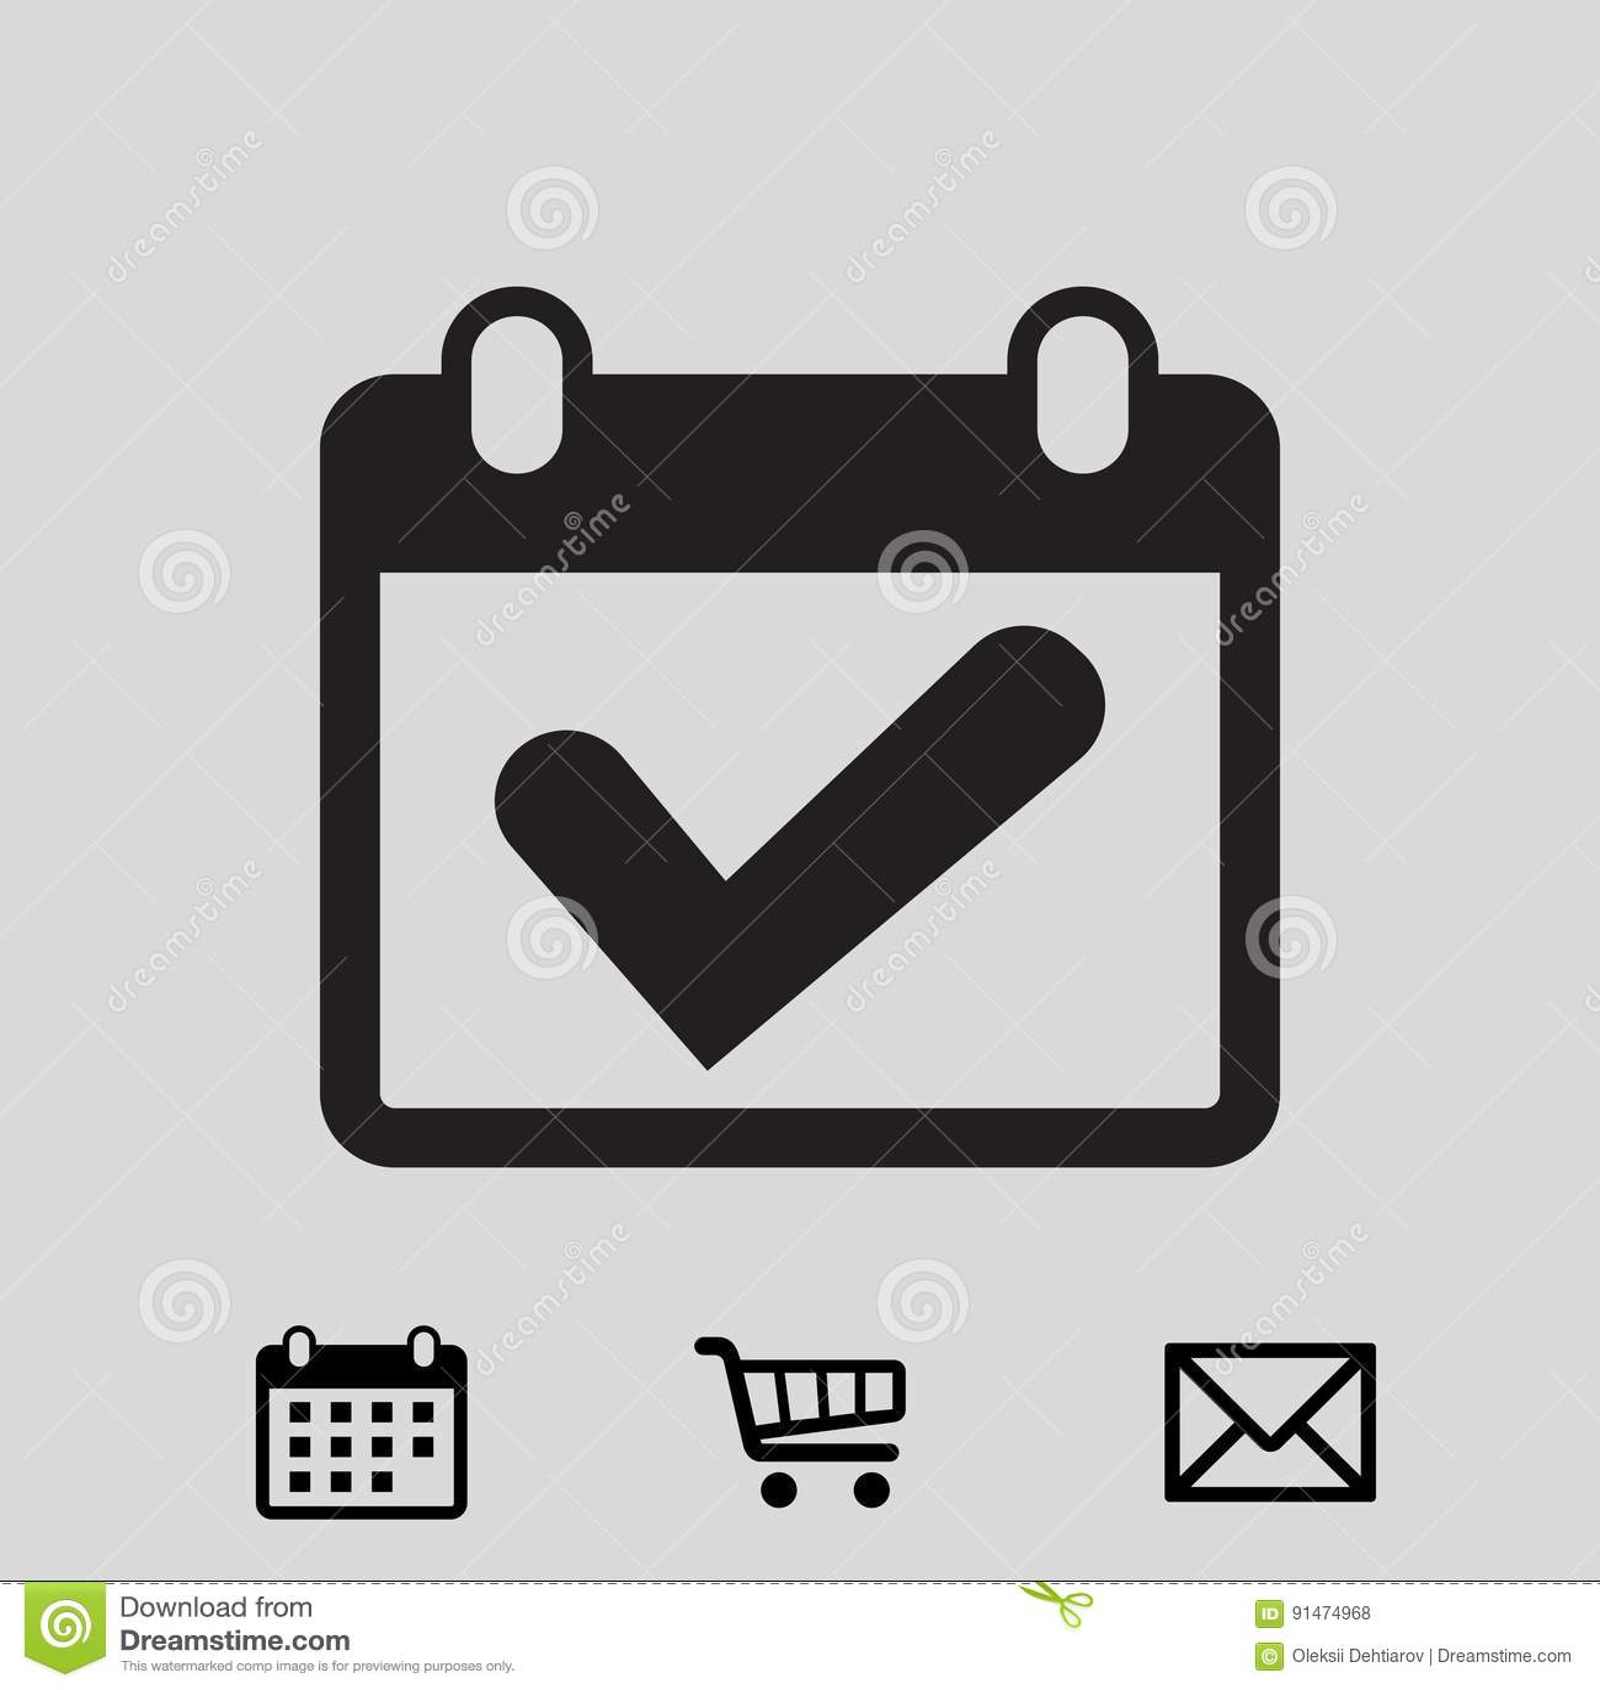 Calendar Flat Illustration : Calendar icon stock vector illustration flat design